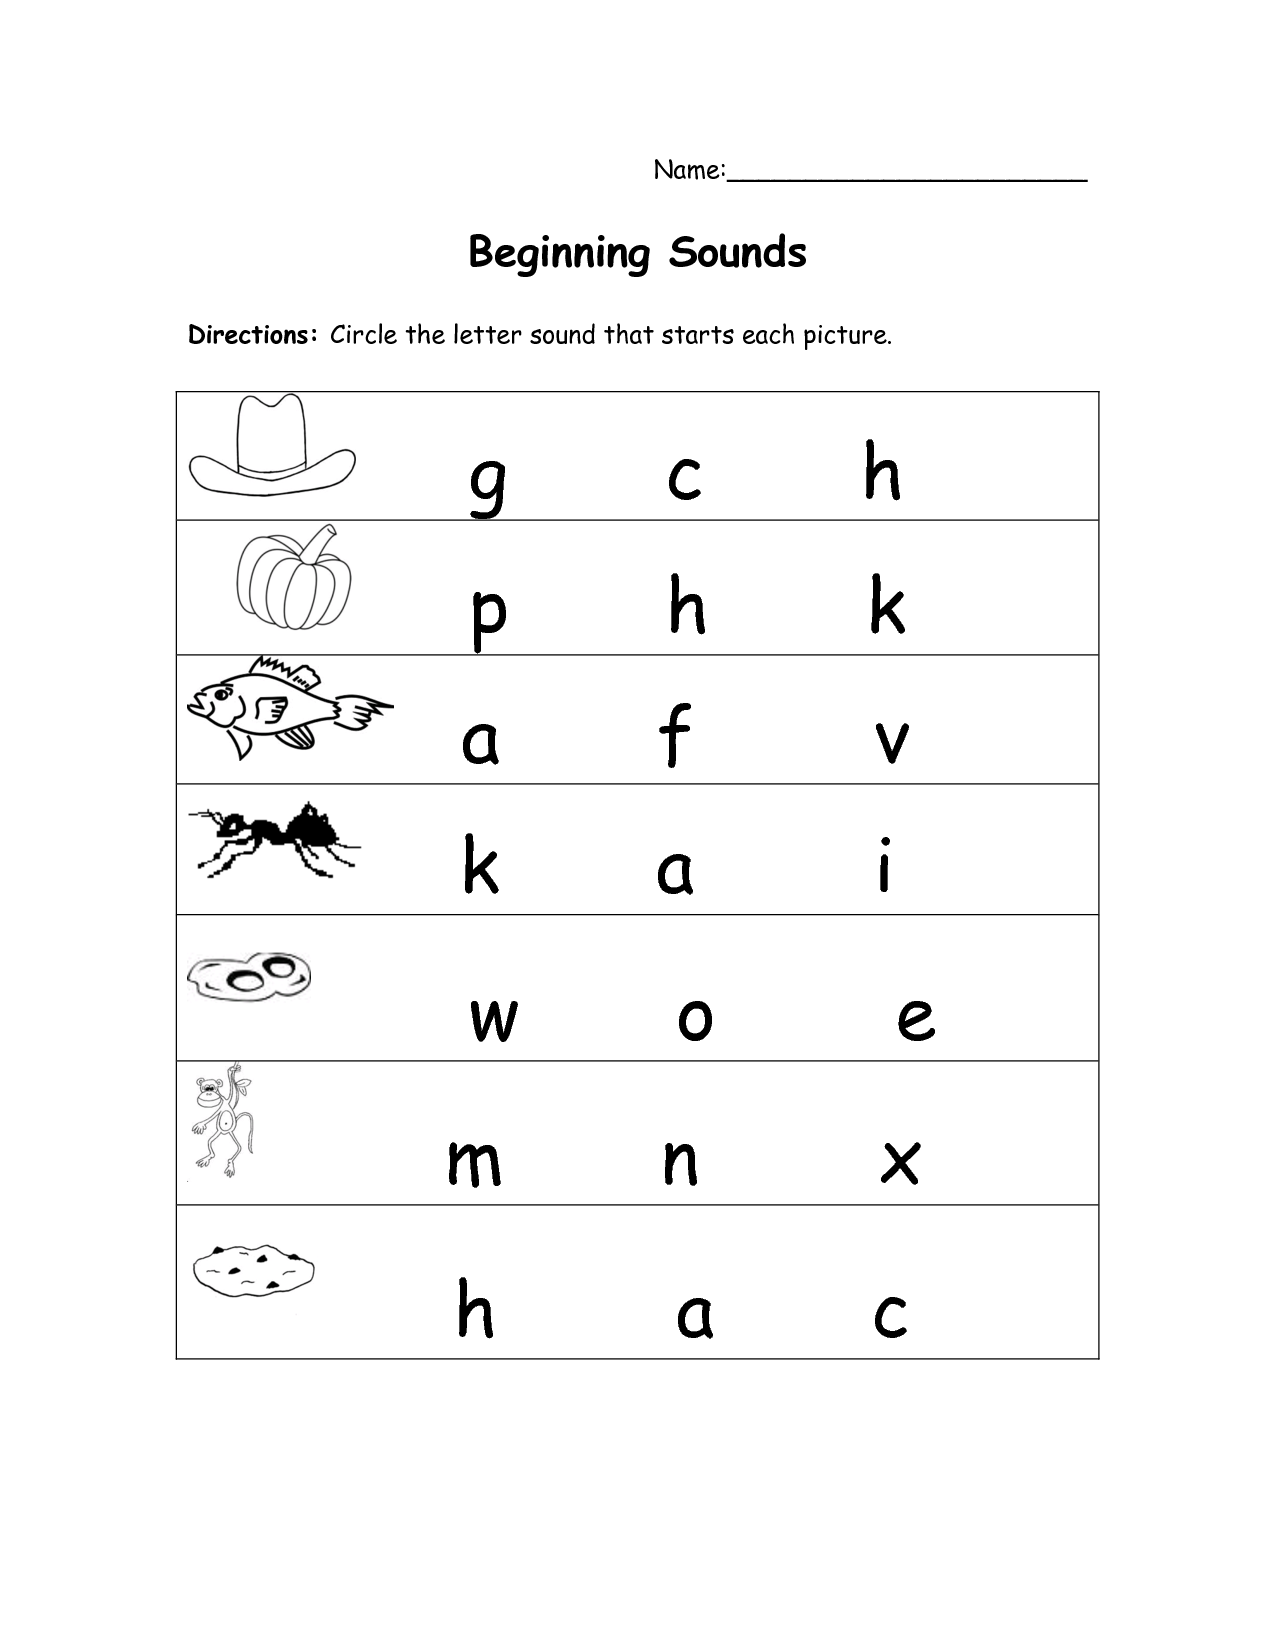 Worksheets Beginning Phonics Worksheets beginning letter sound activities danasokc top abc pinterest top